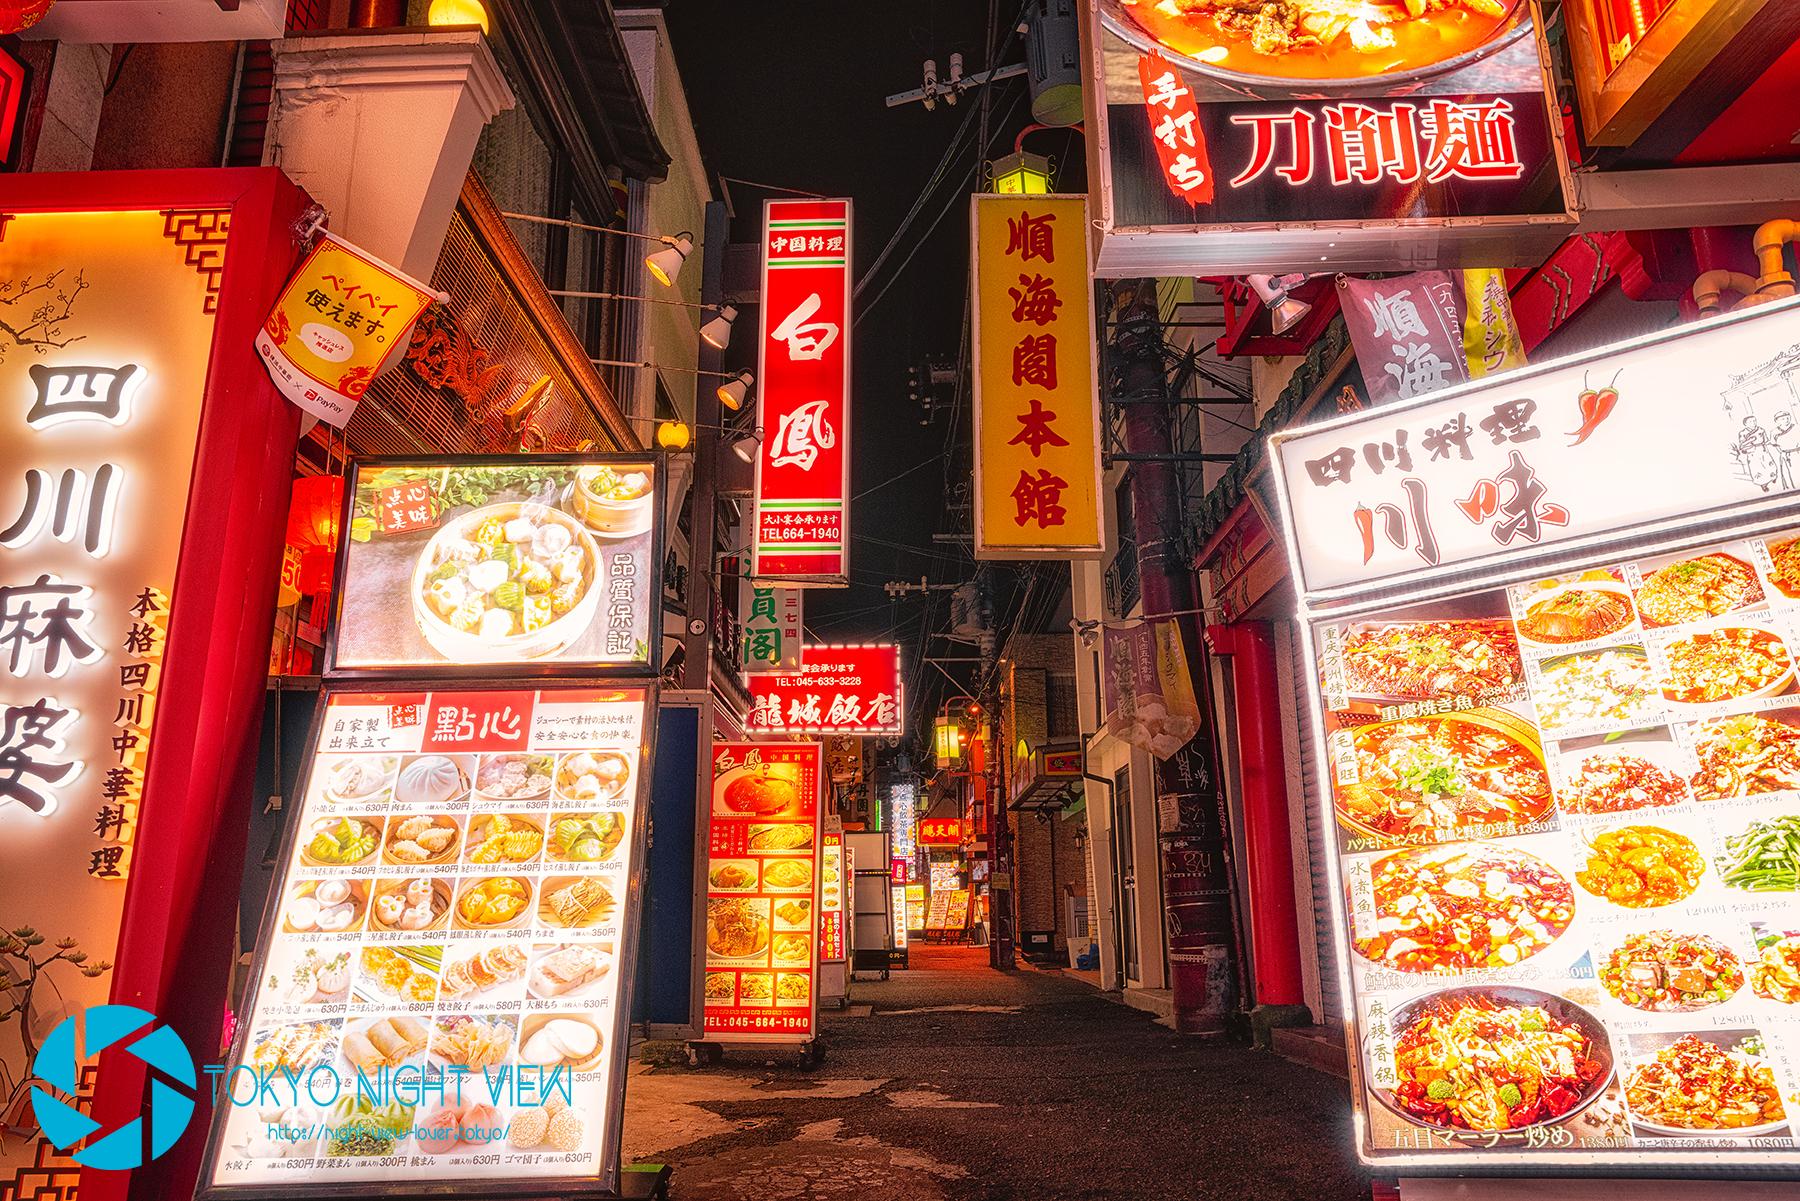 横浜中華街 Yokohama Chinatown